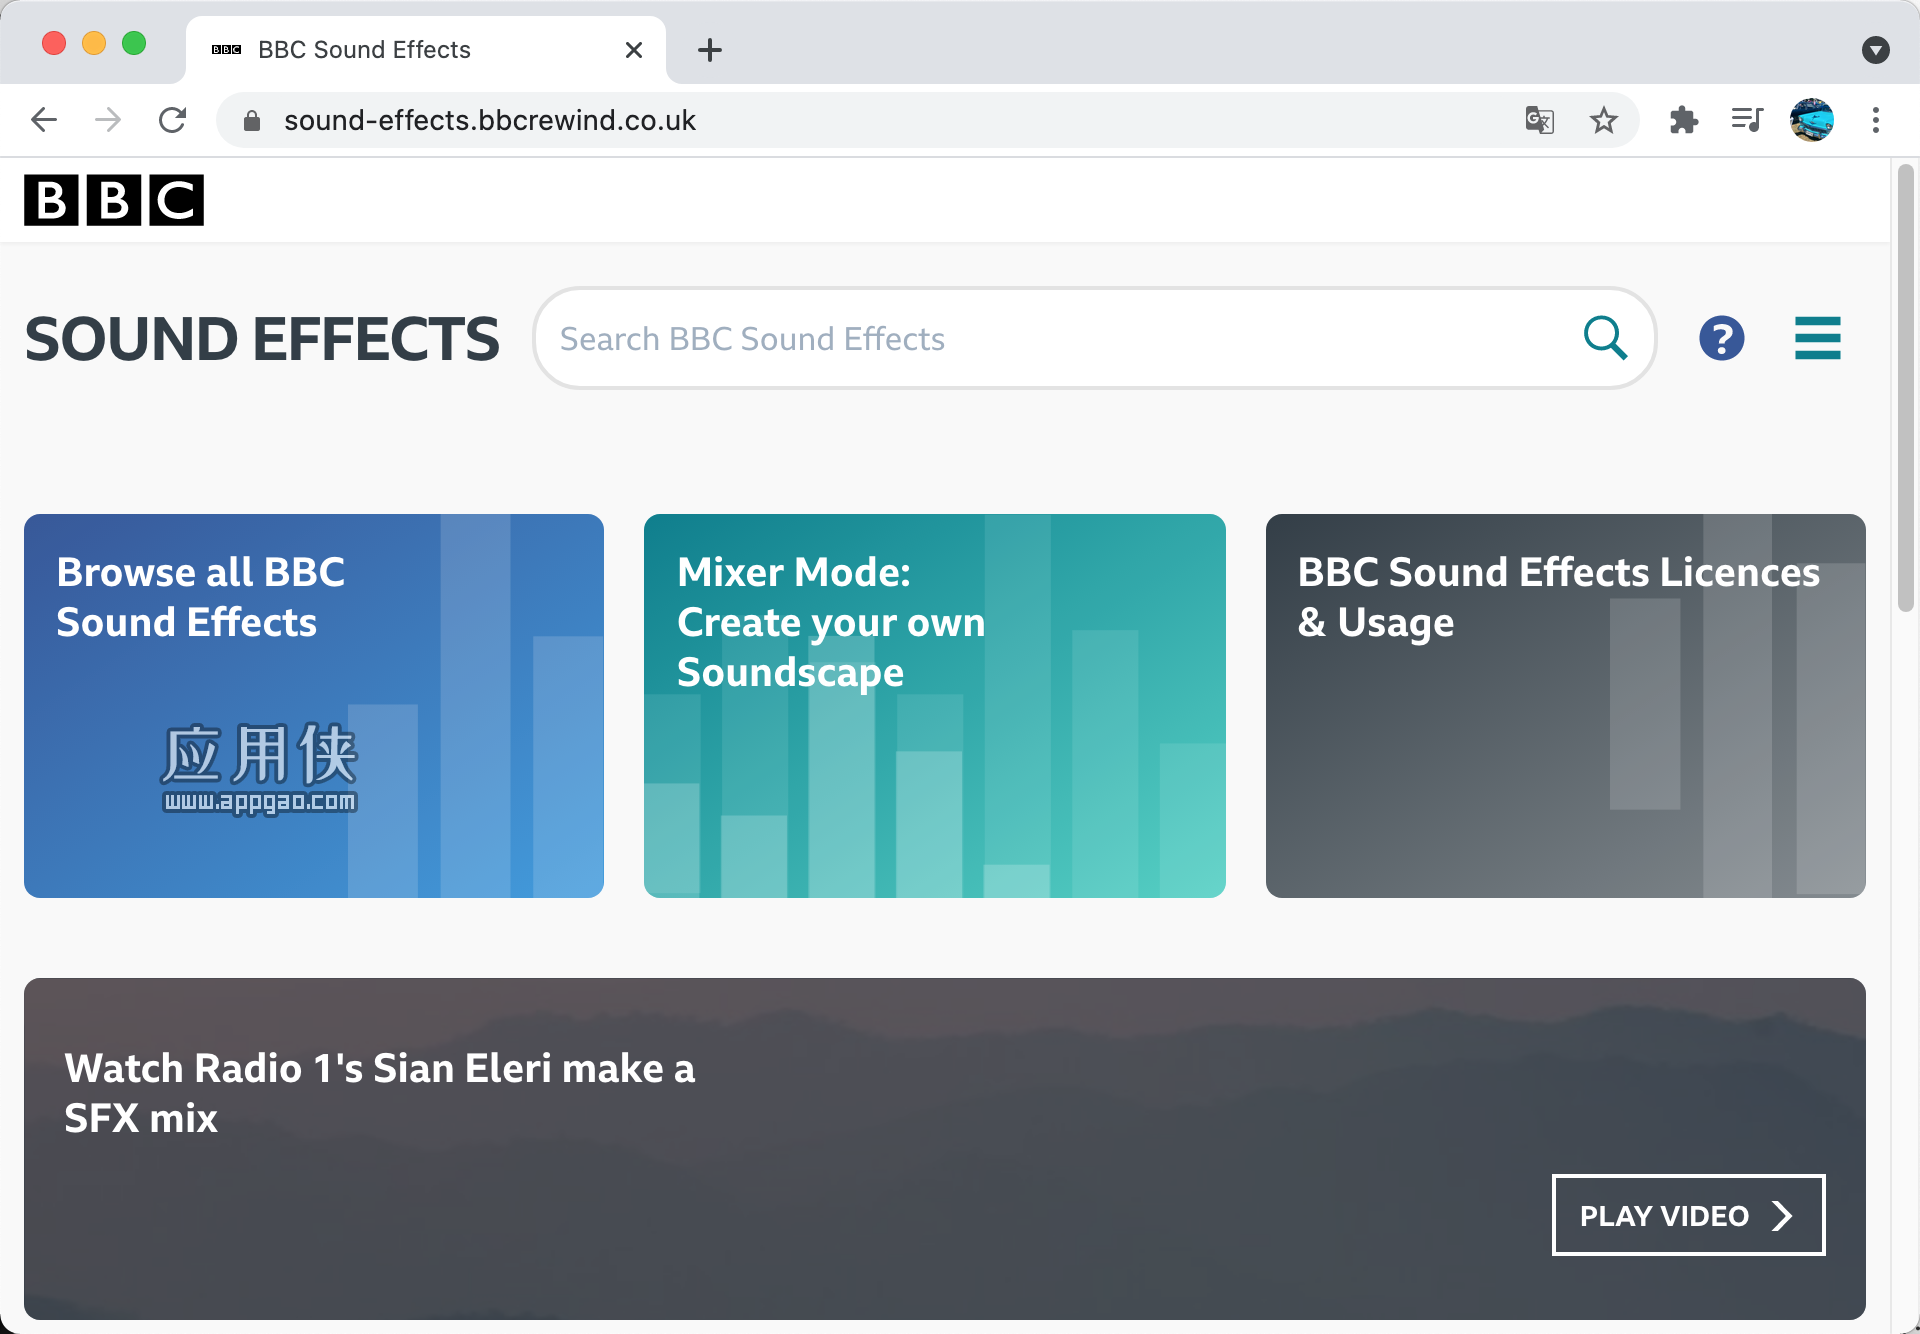 BBC Sound Effects - BBC 官方资源上万个音效素材免费下载